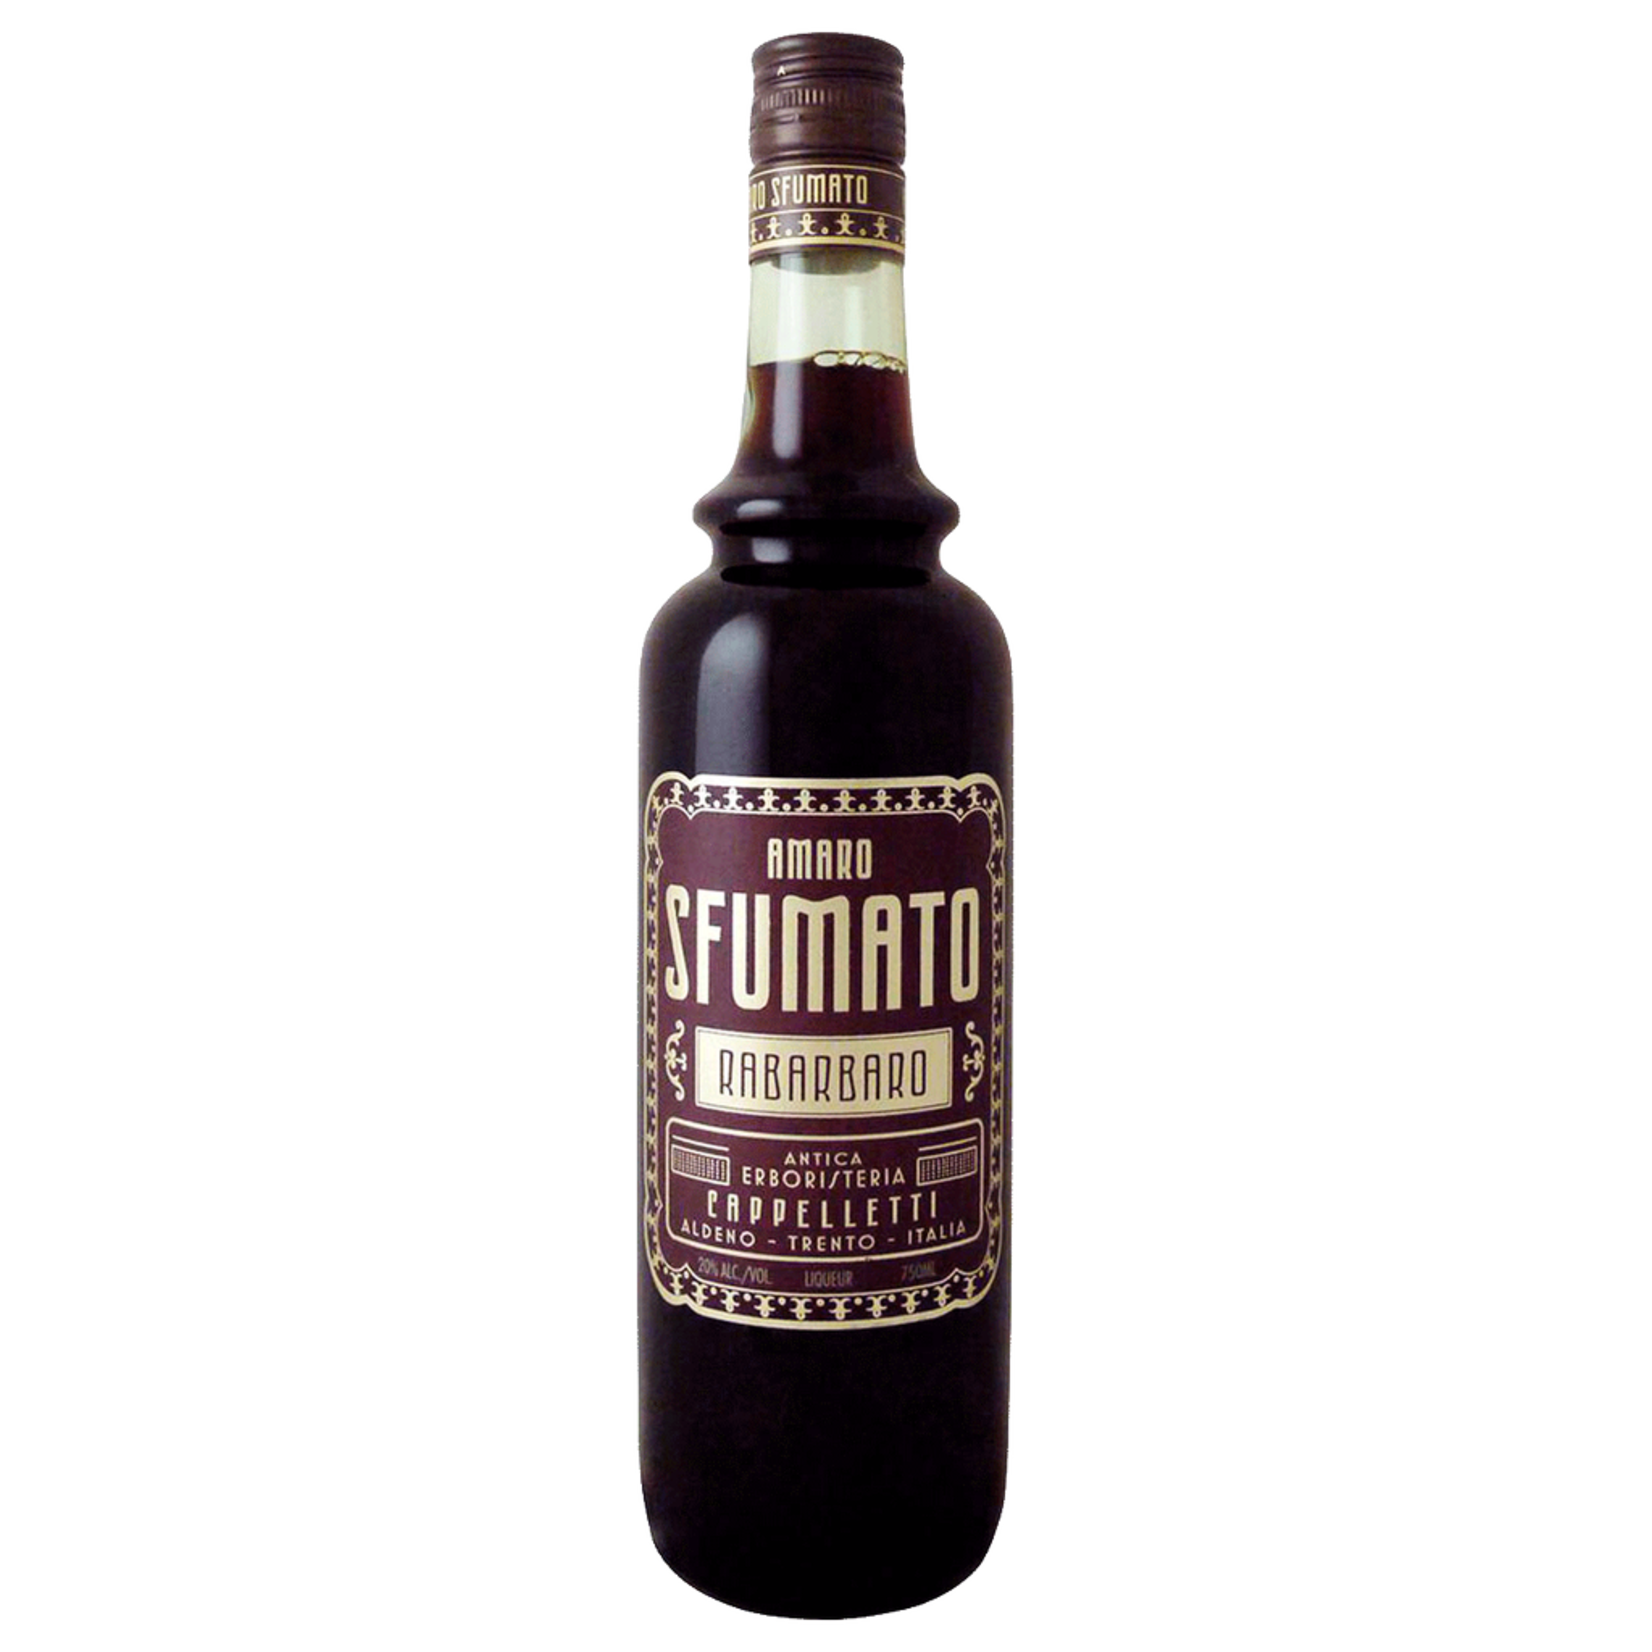 Spirits Cappelletti Amaro Sfumato Rabarbaro